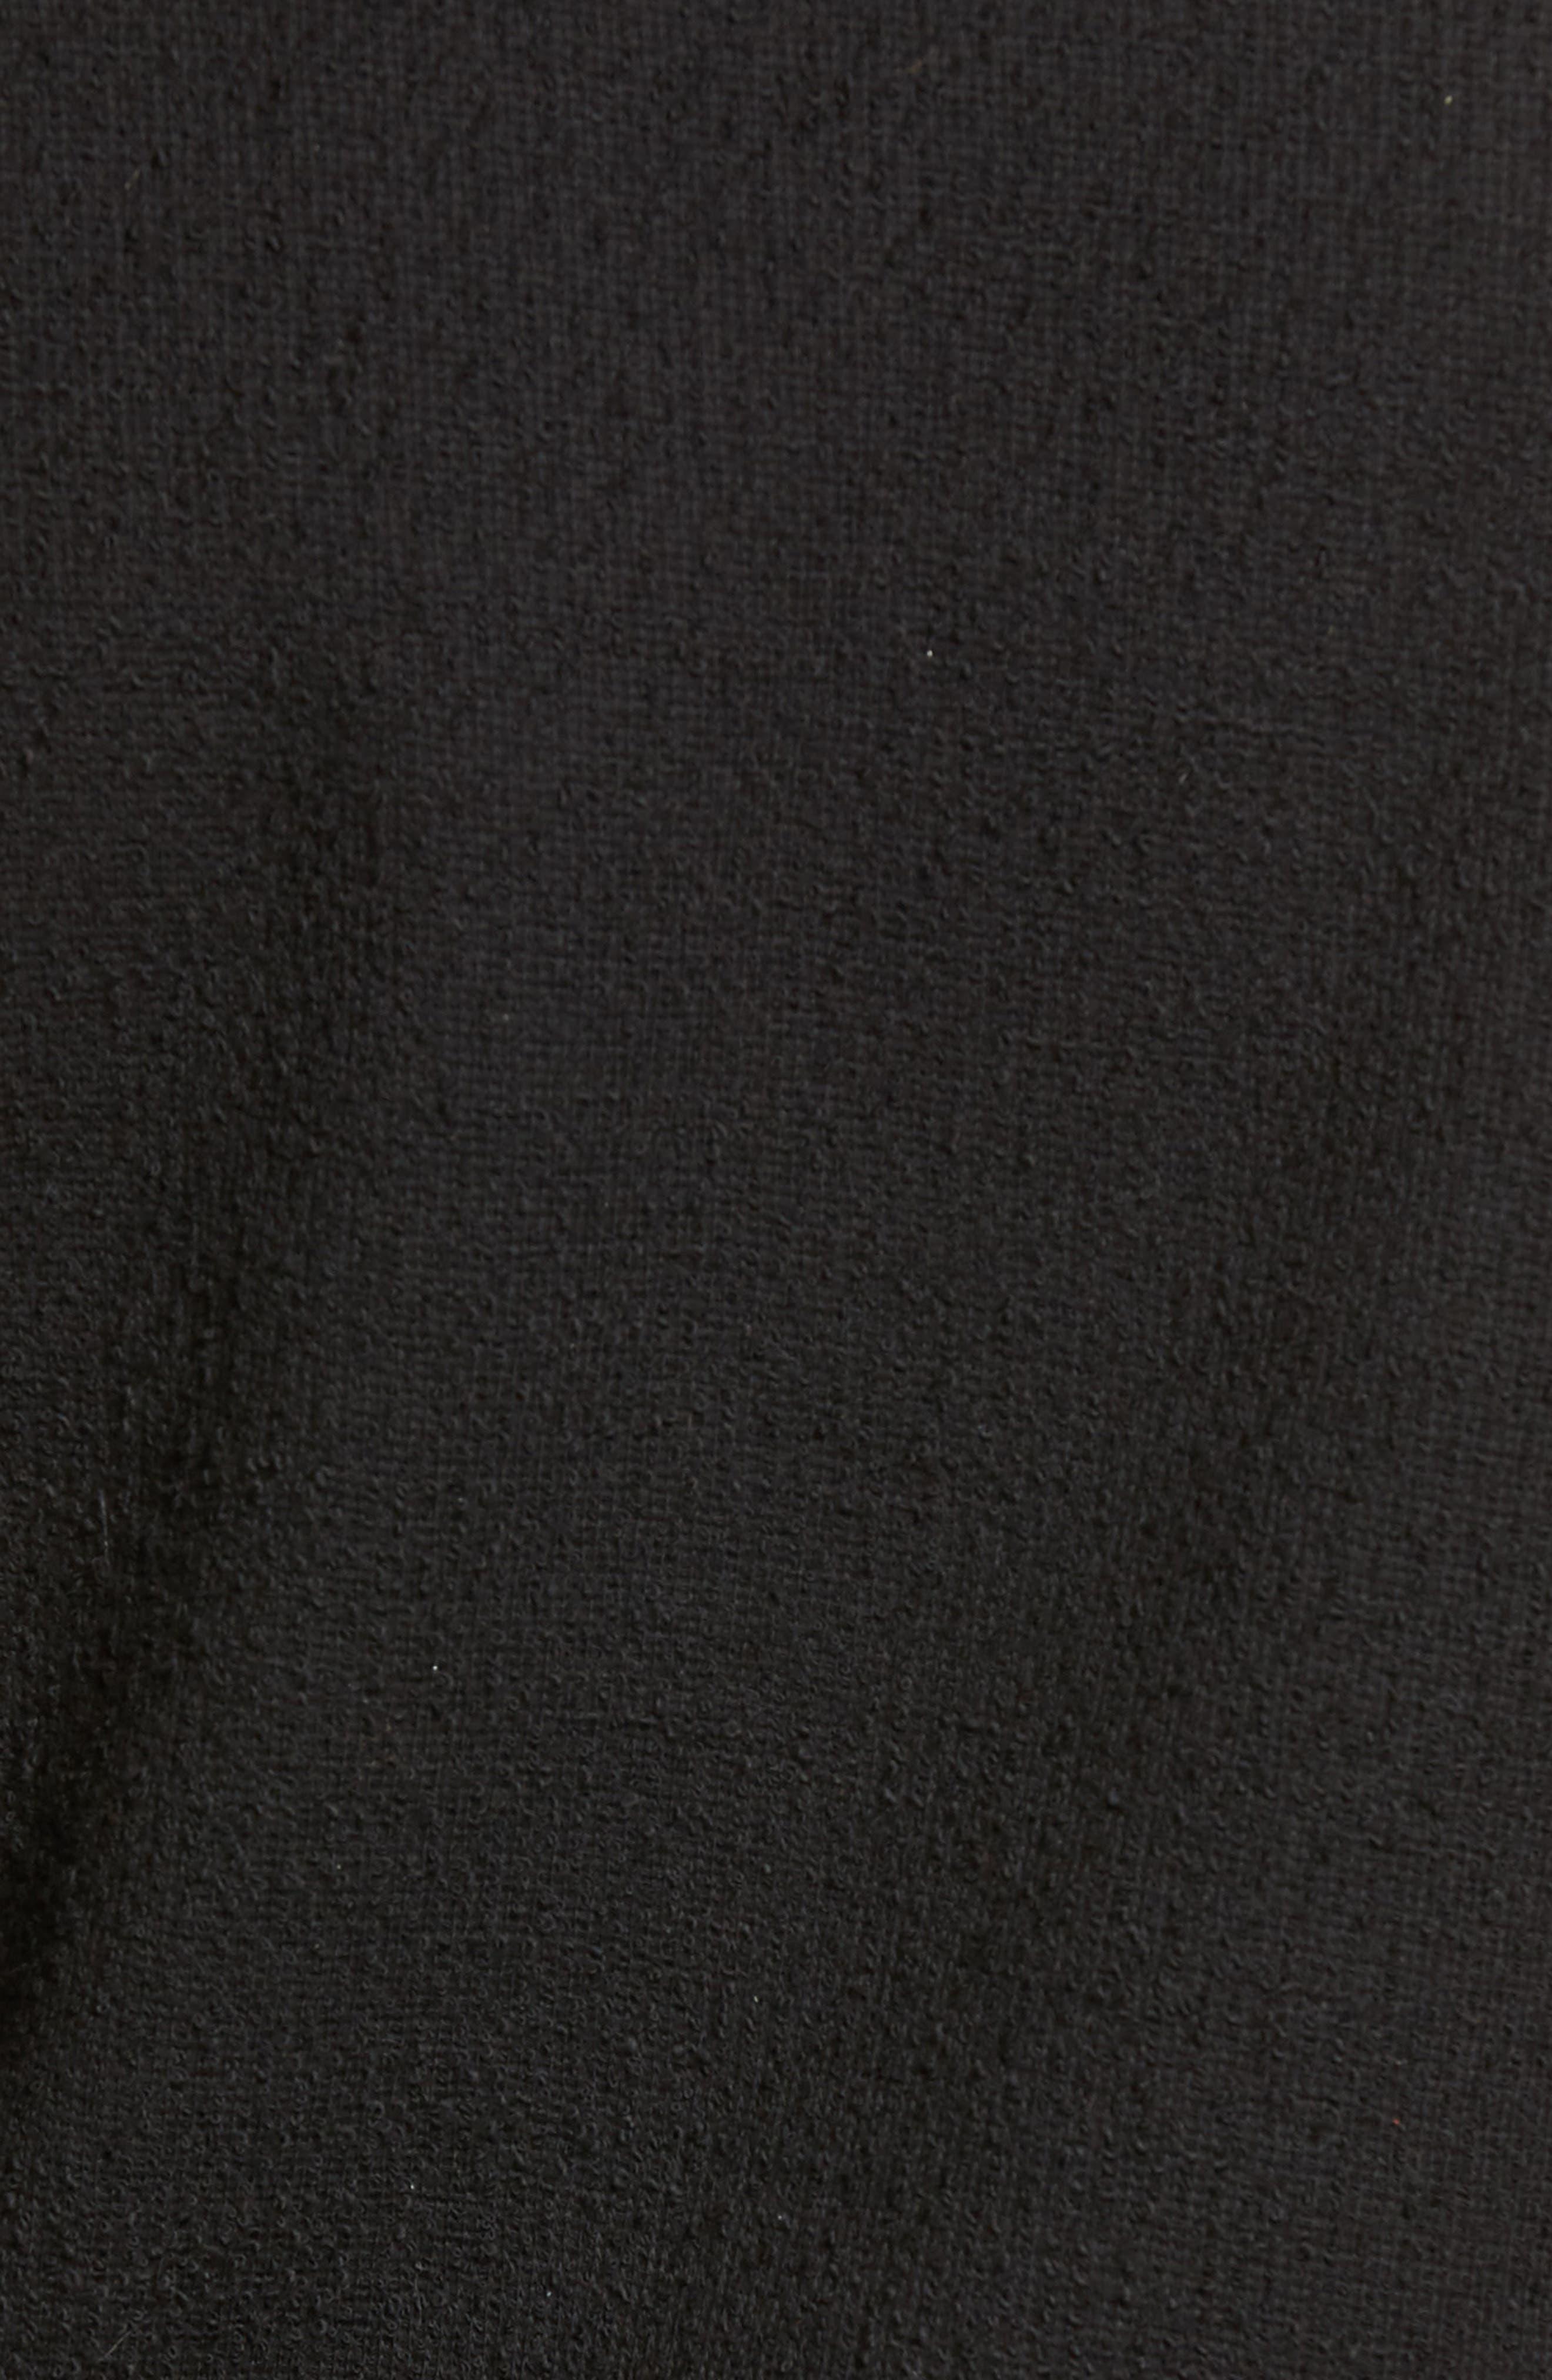 Textured Tie Front Top,                             Alternate thumbnail 5, color,                             TRUE BLACK